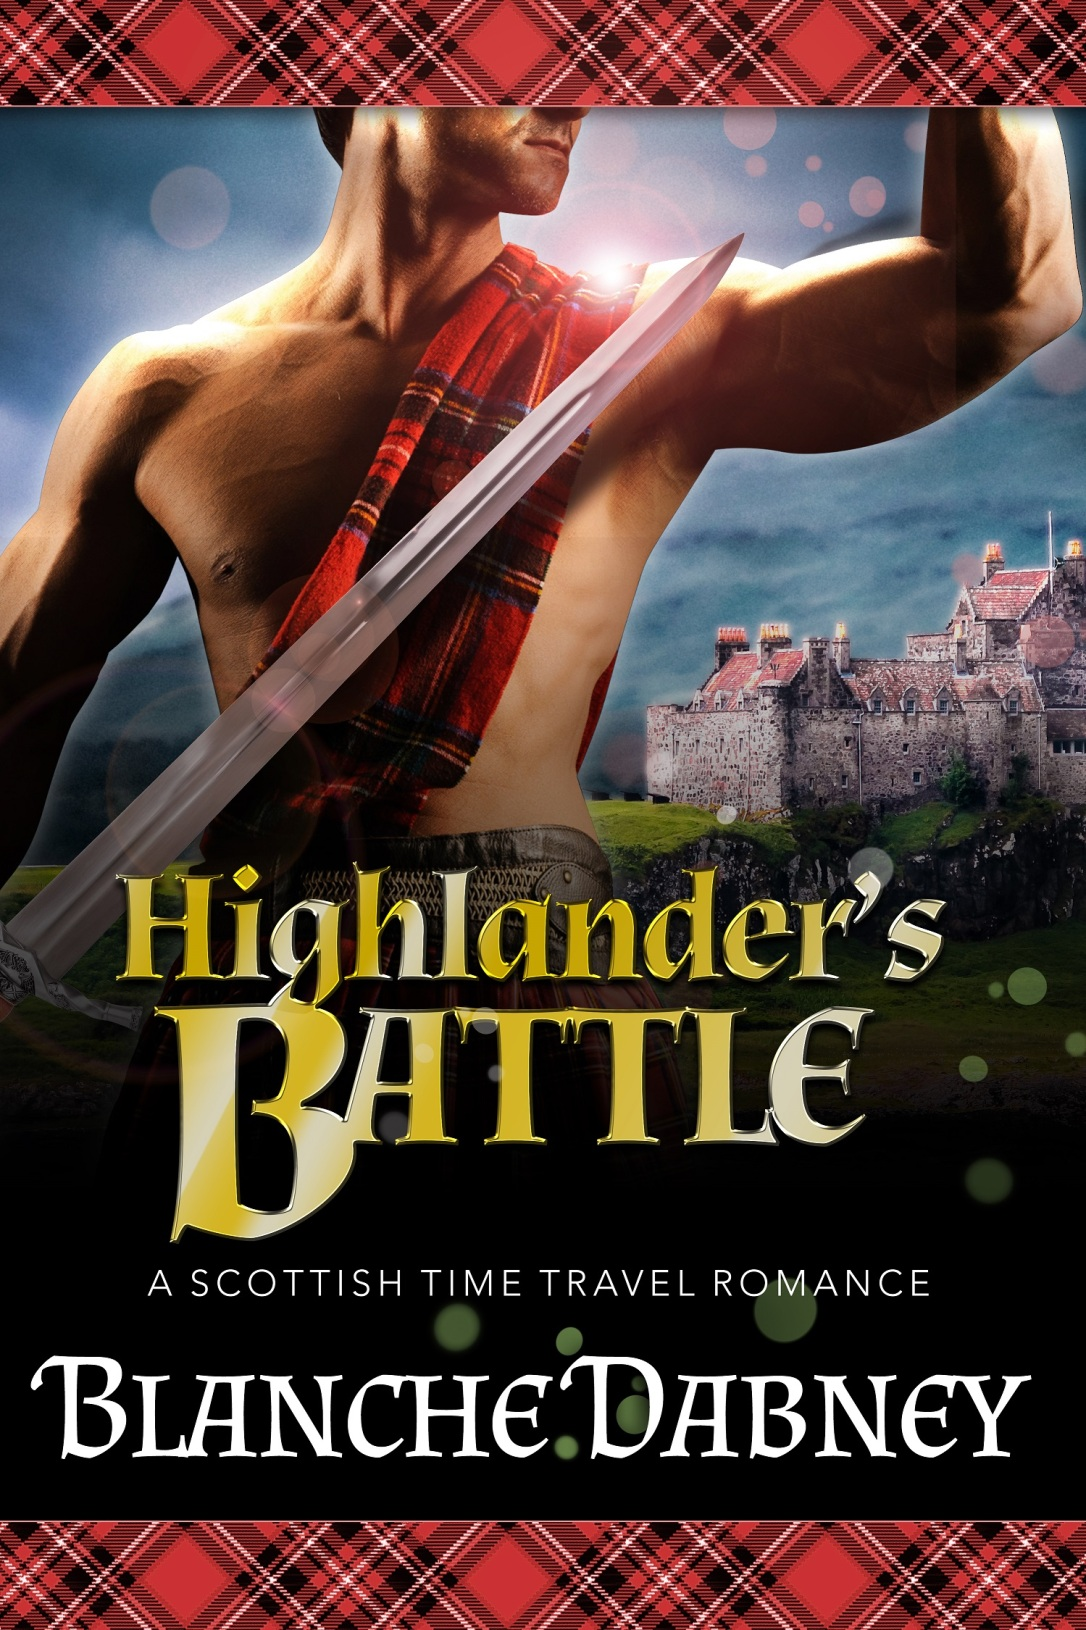 HighlandersBattle2edit